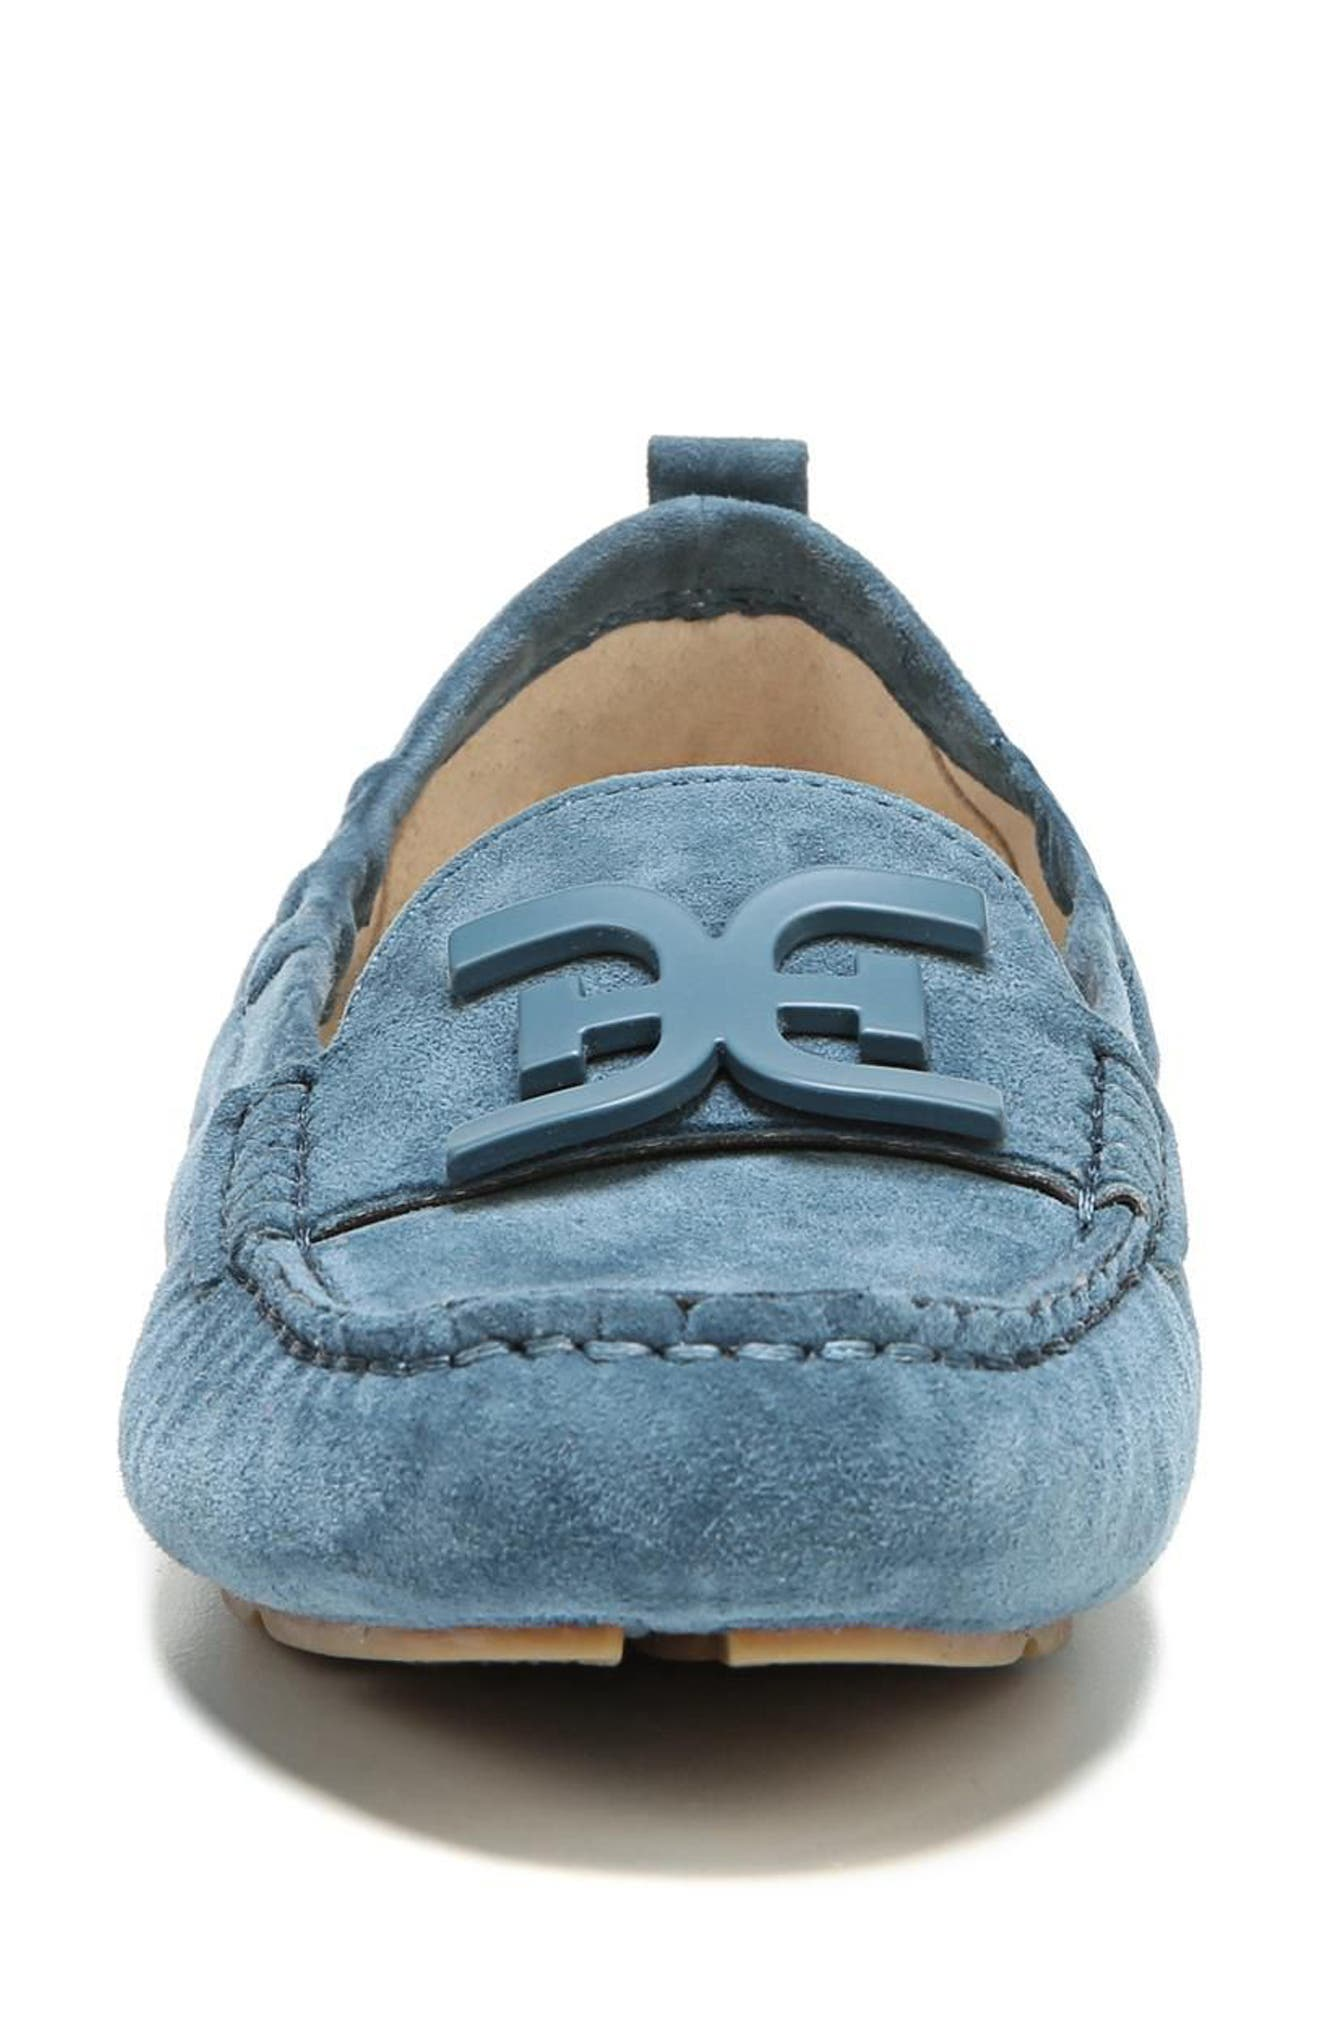 Farrell Moccasin Loafer,                             Alternate thumbnail 4, color,                             Denim Blue Suede